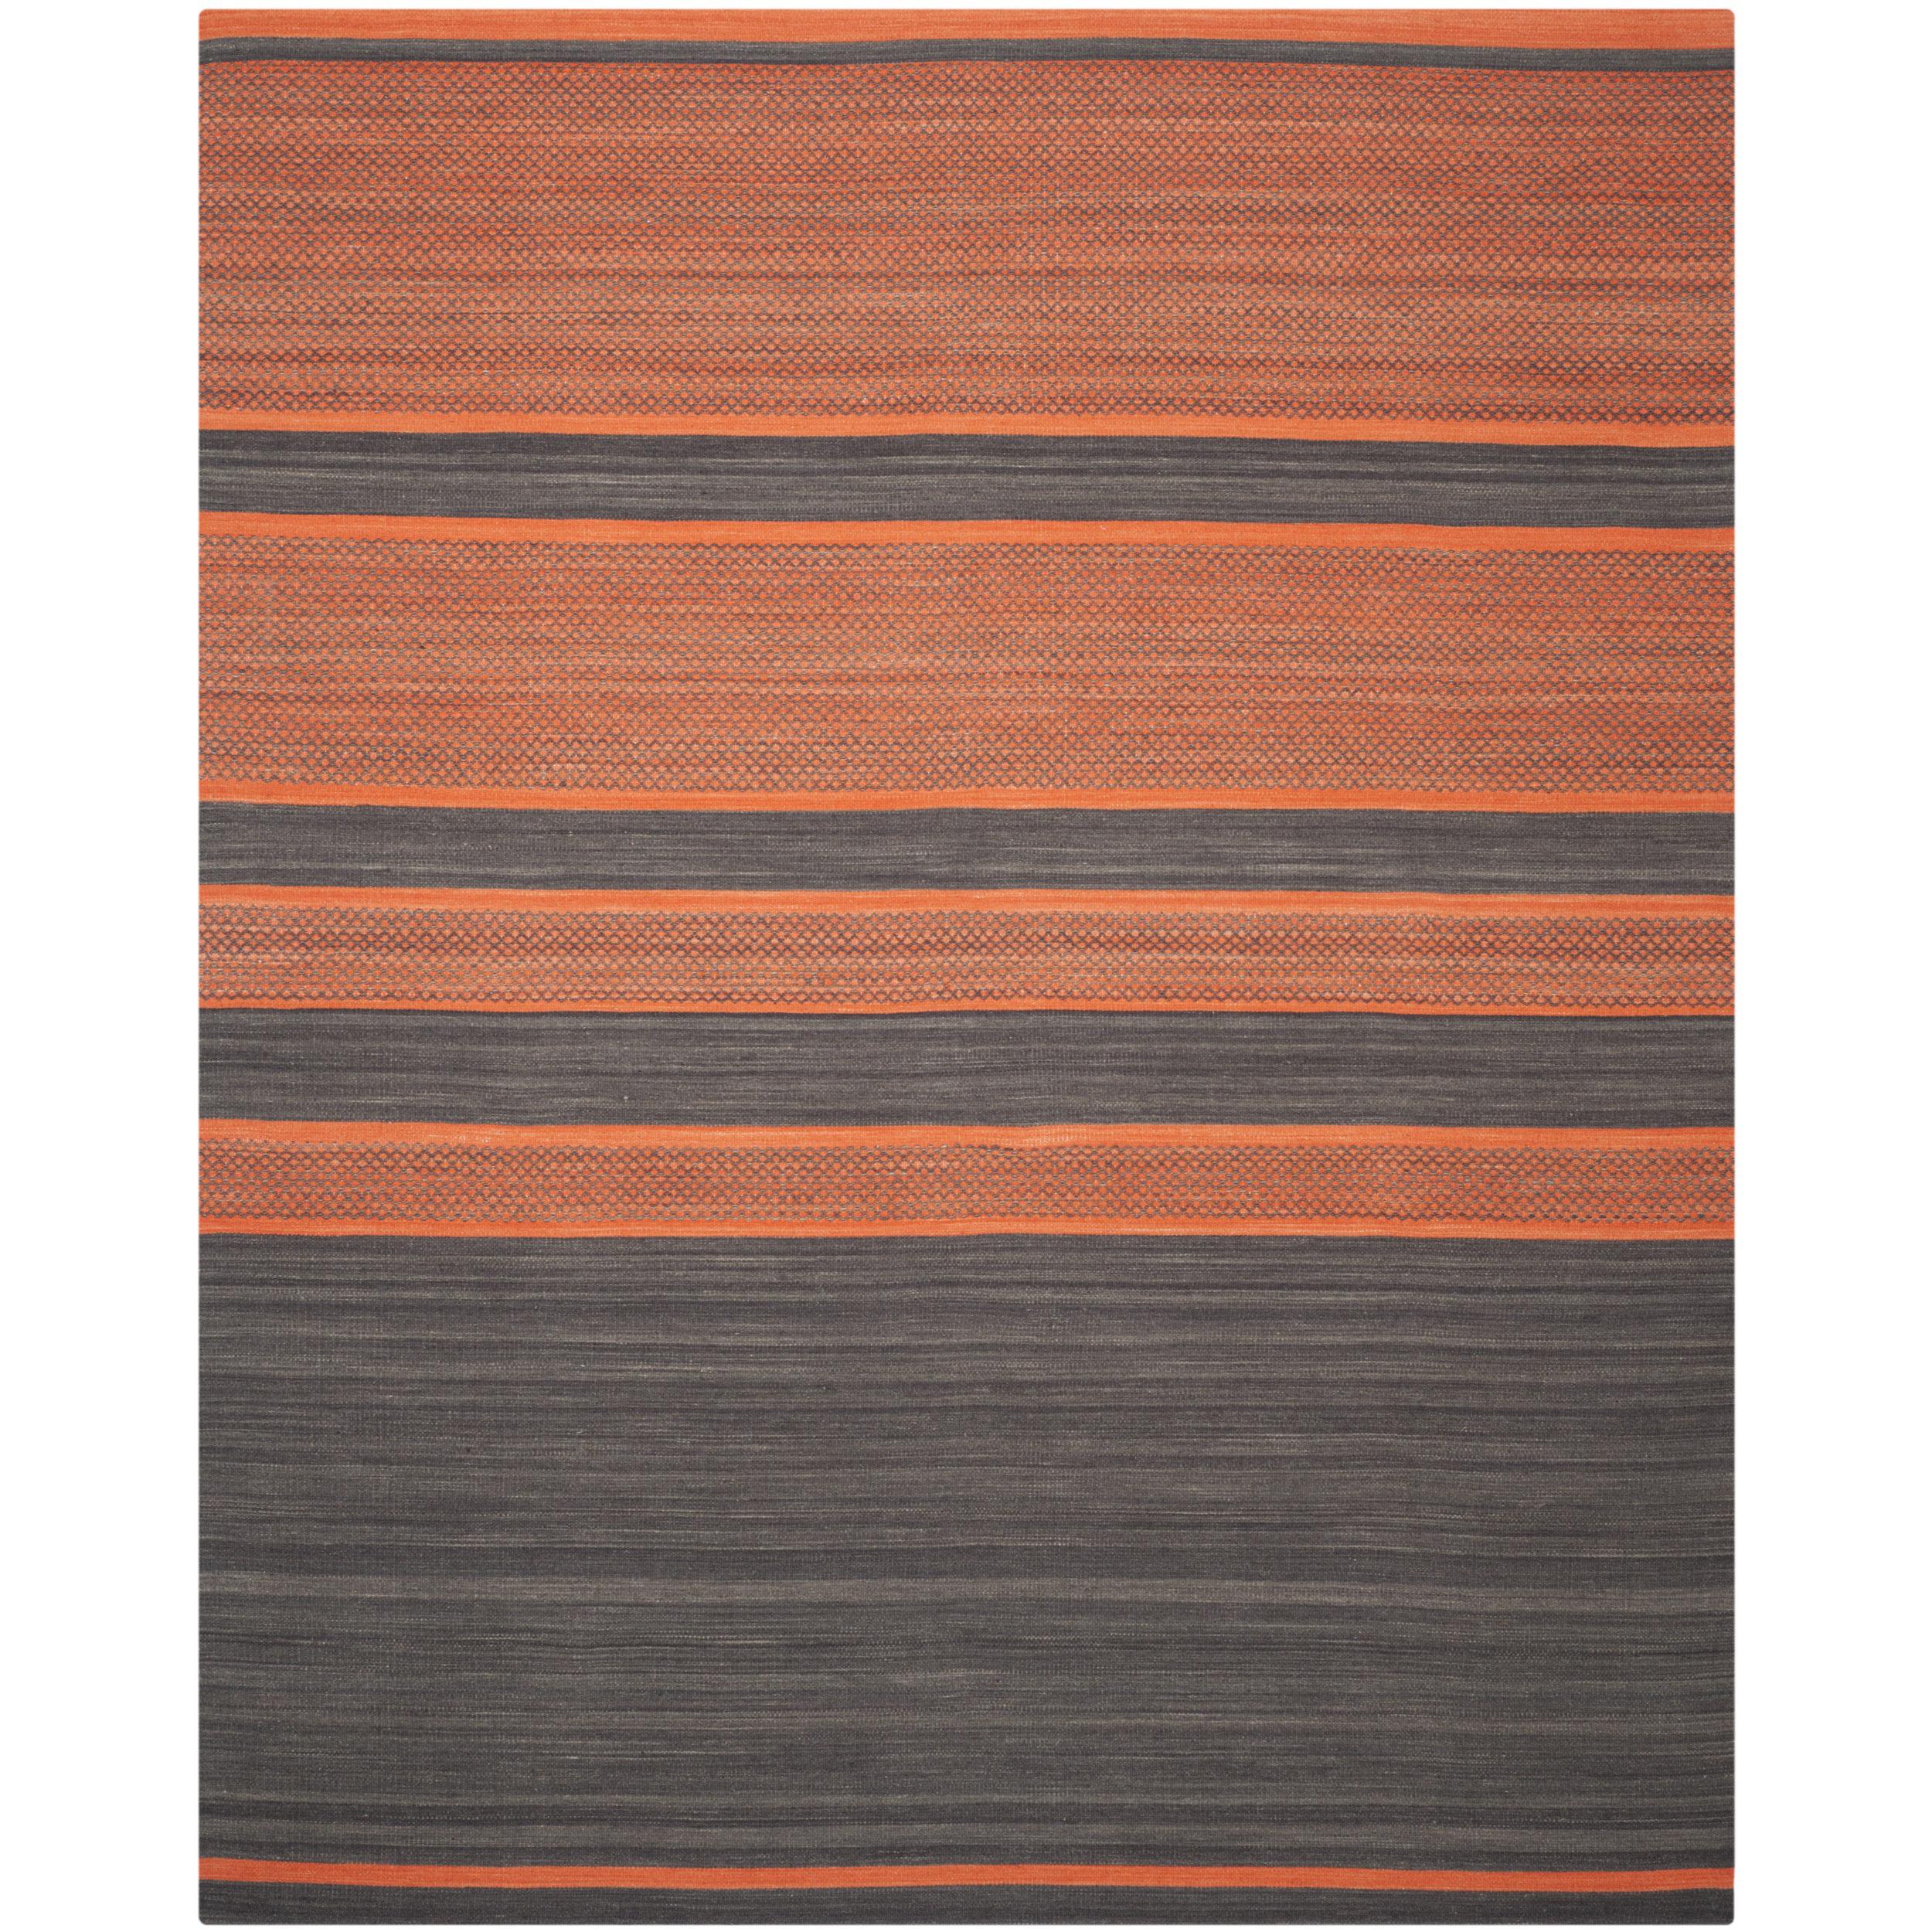 Area Rug 8x10 Orange: Safavieh Kilim Hand Woven Cotton Grey/Orange Area Rug